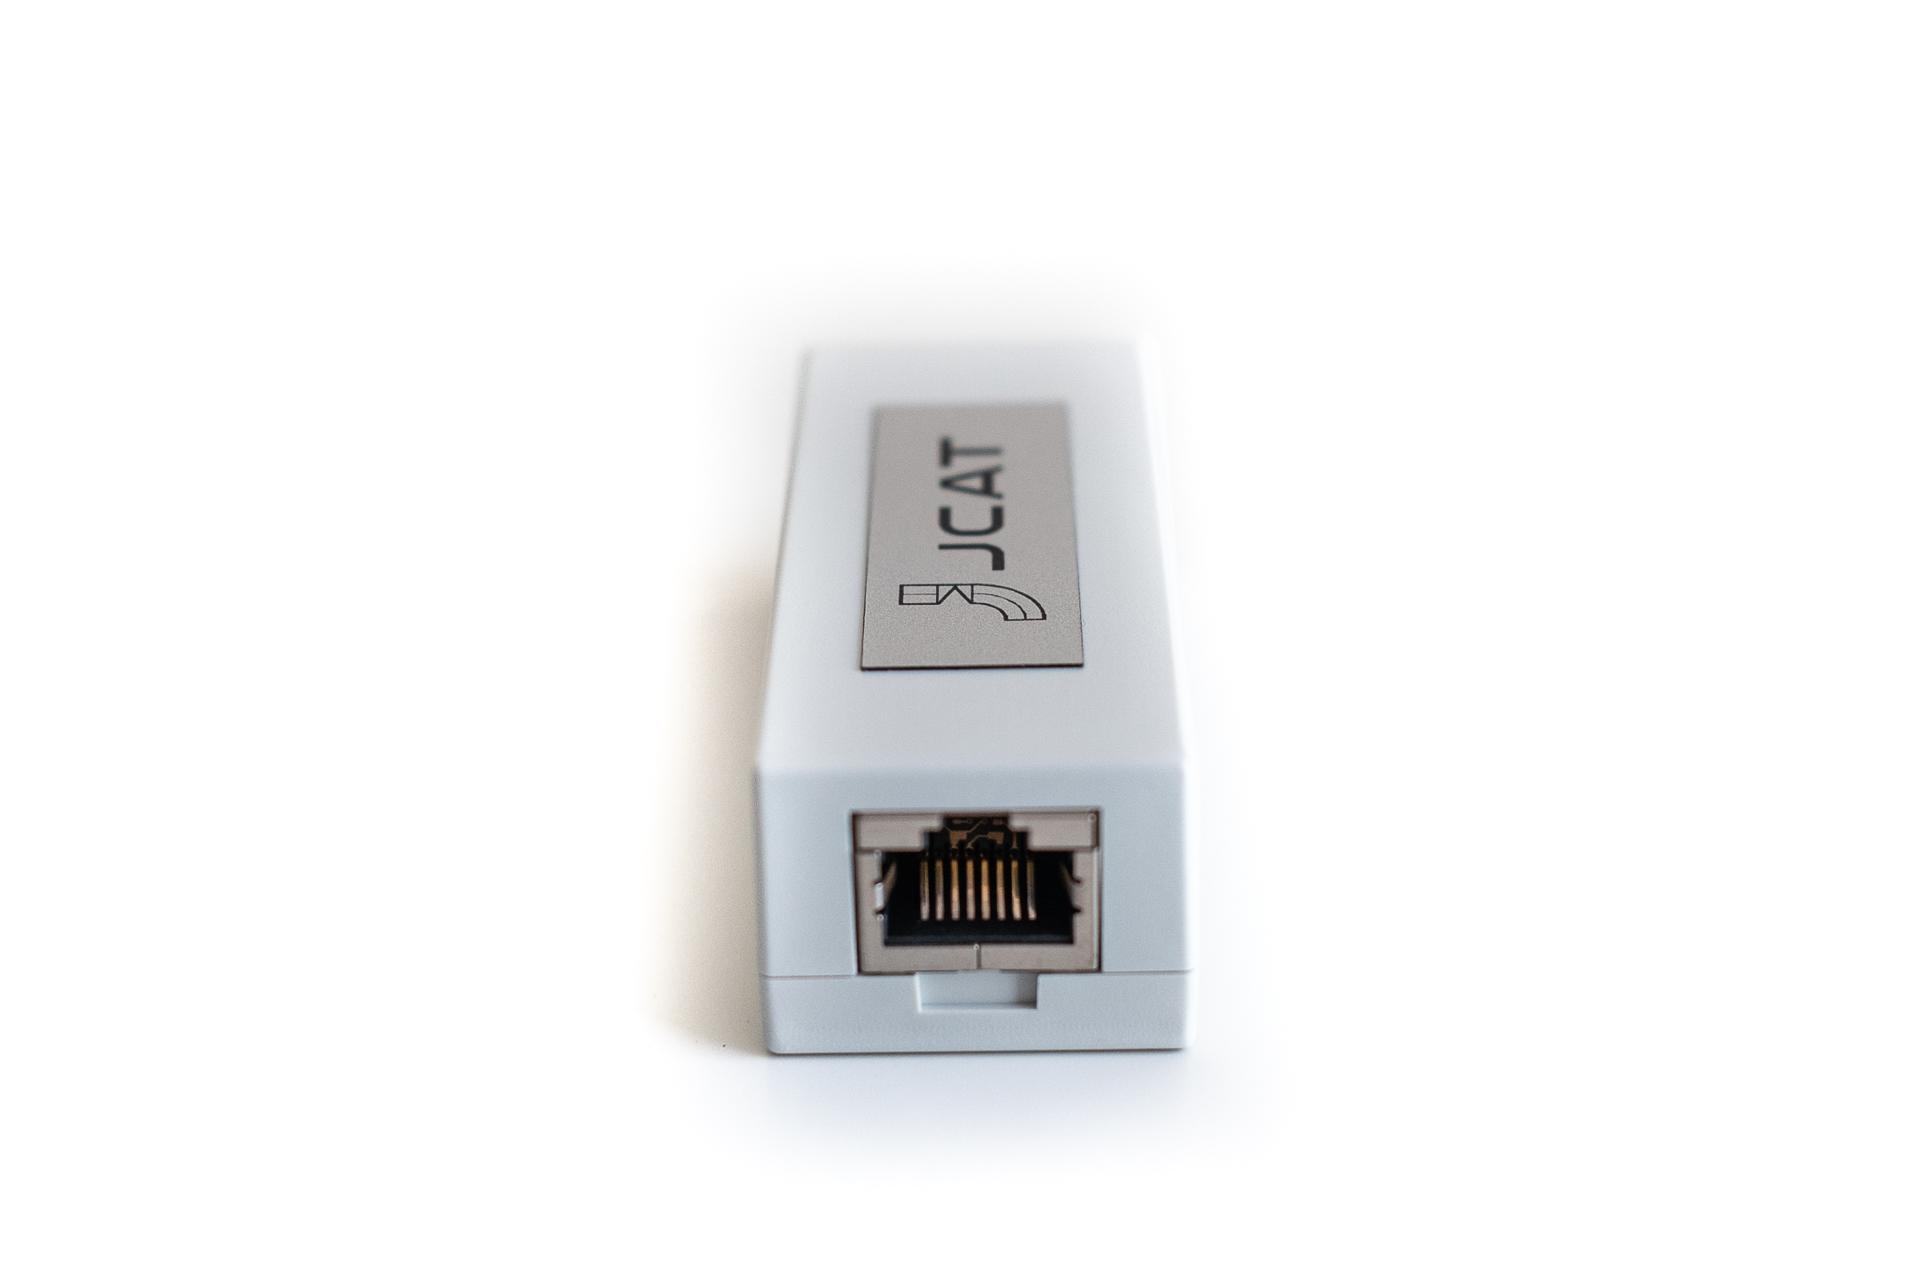 galvanic network isolator for audiophiles